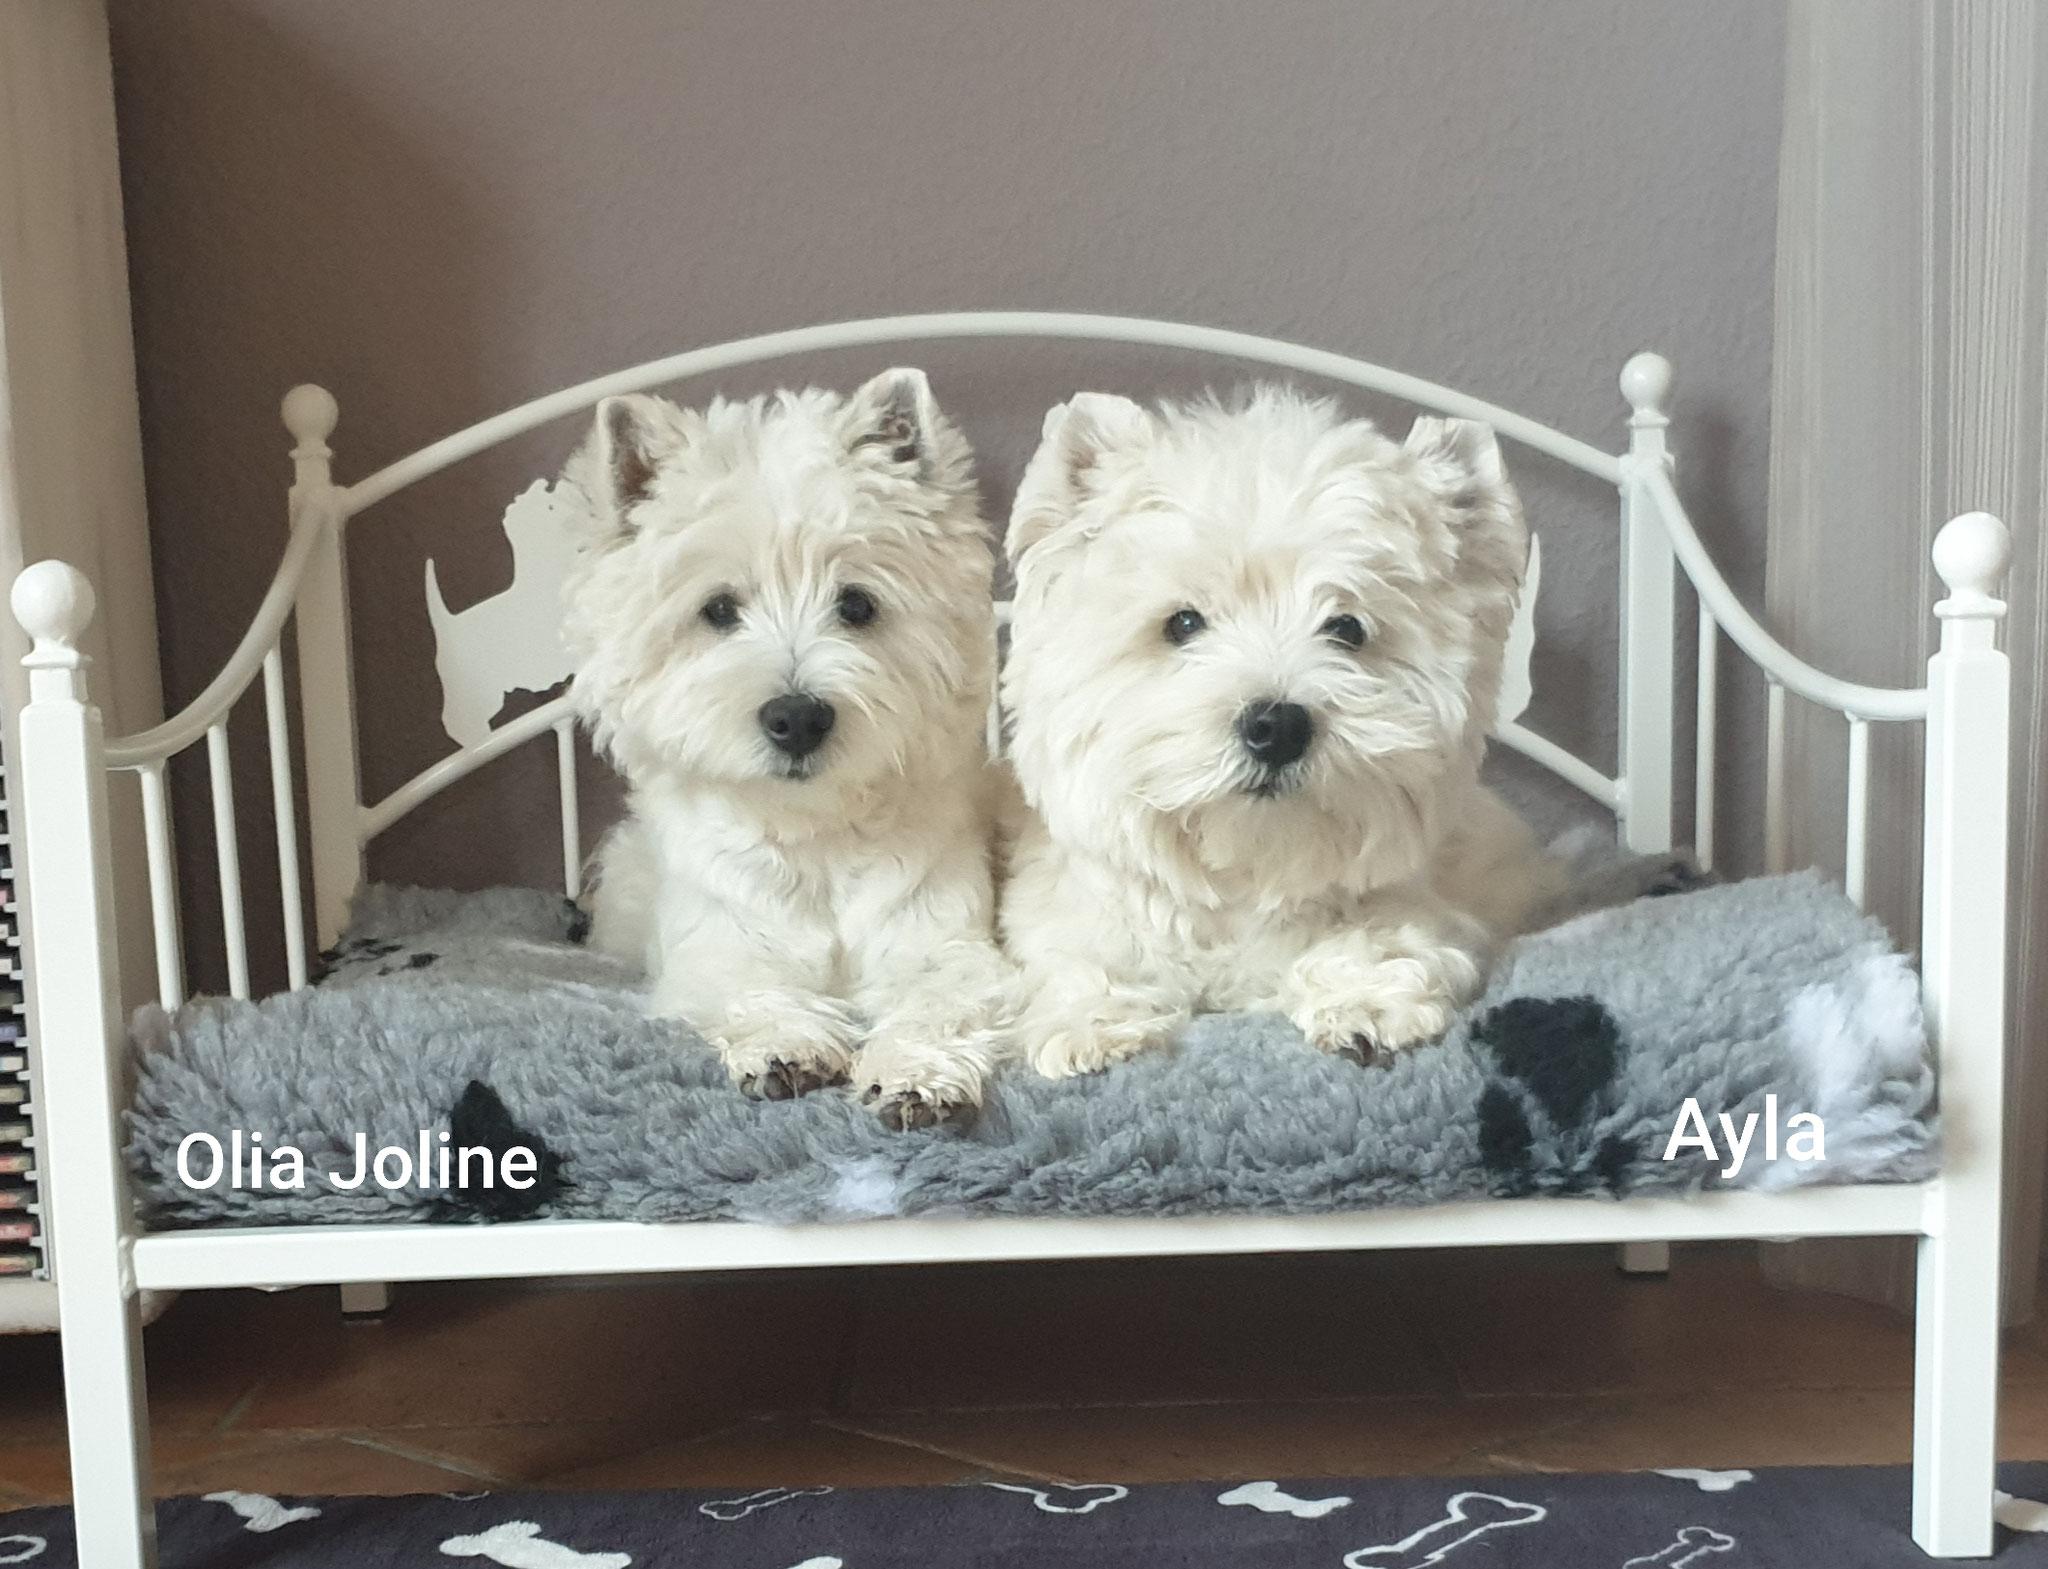 Olia Joline und Ayla 04/2019